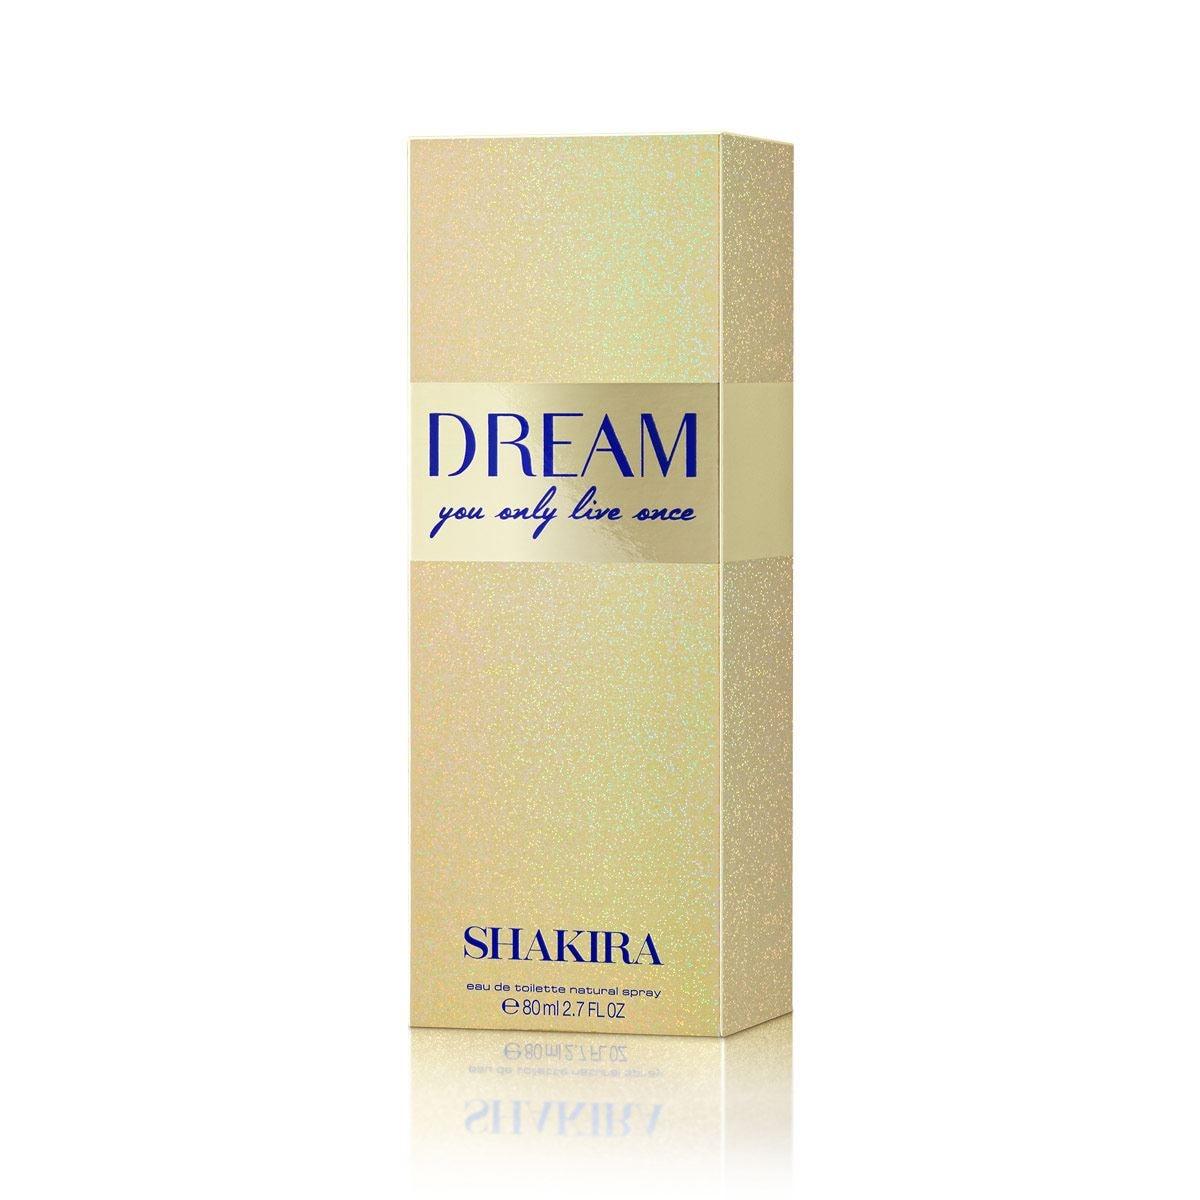 Fragancia para Dama, Shakira, Dream, EDT 80 ml